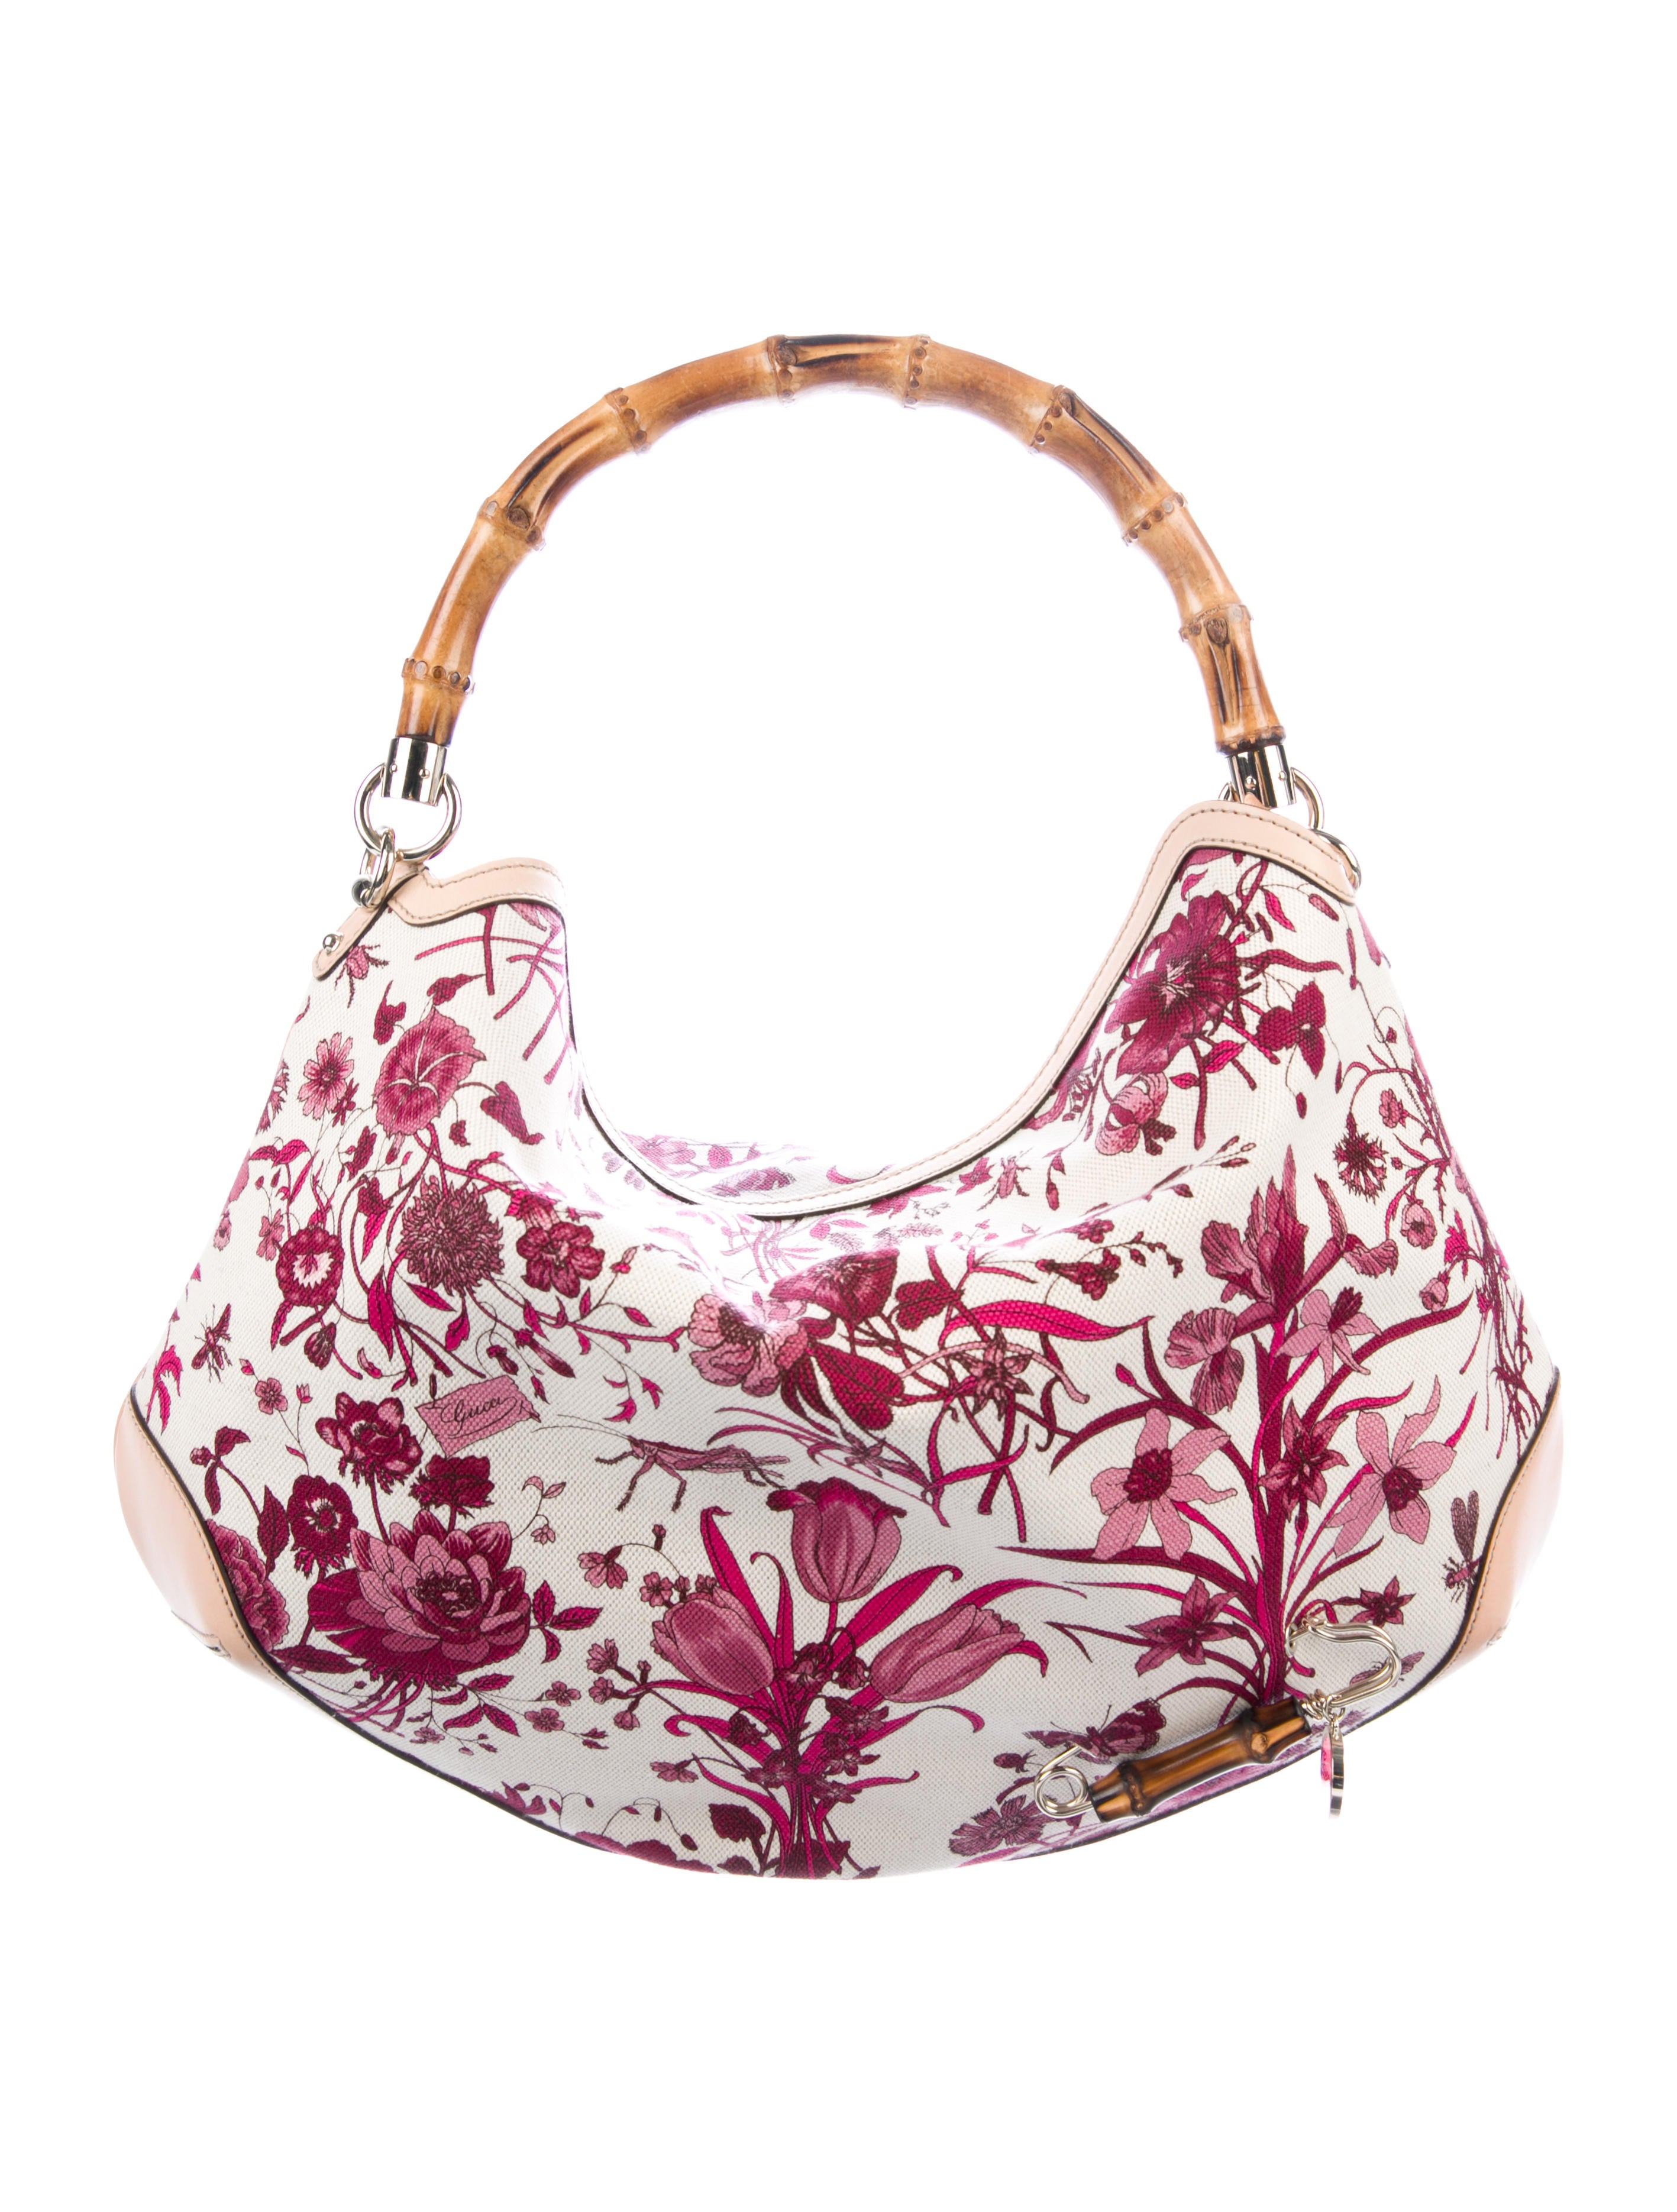 82345132315 Gucci Peggy Flora Bamboo Hobo - Handbags - GUC275897